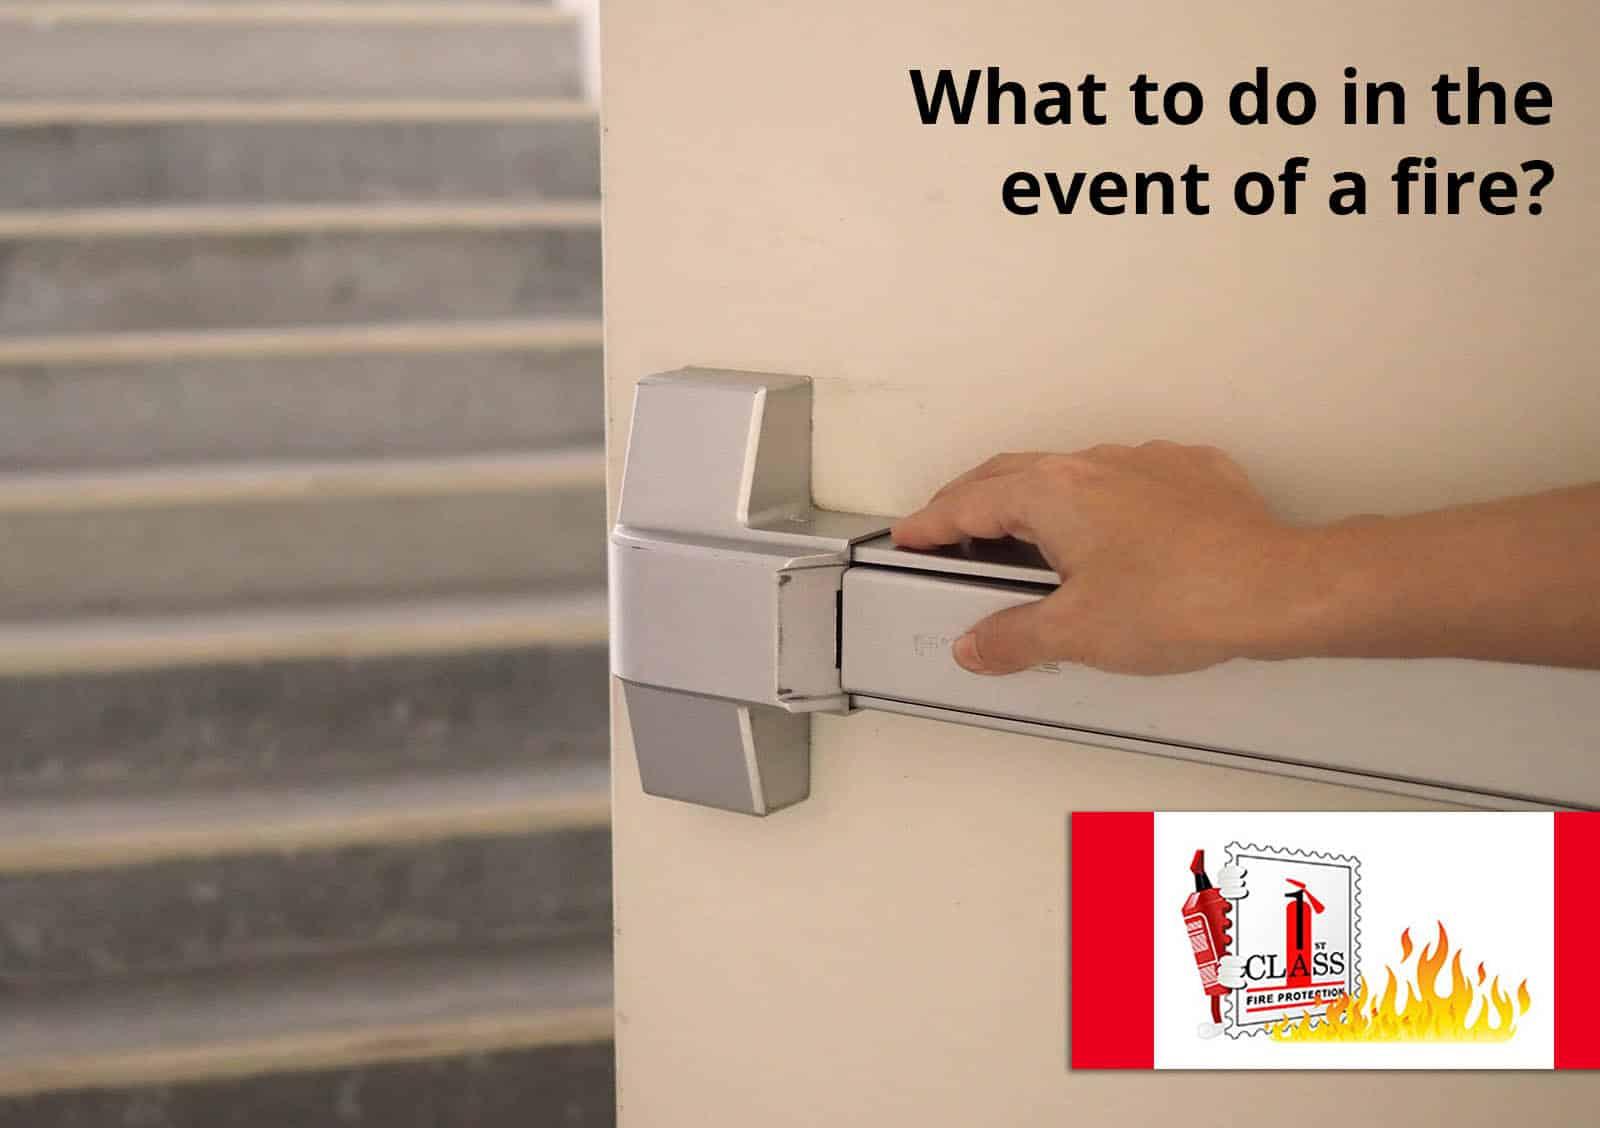 exiting building fire alarm